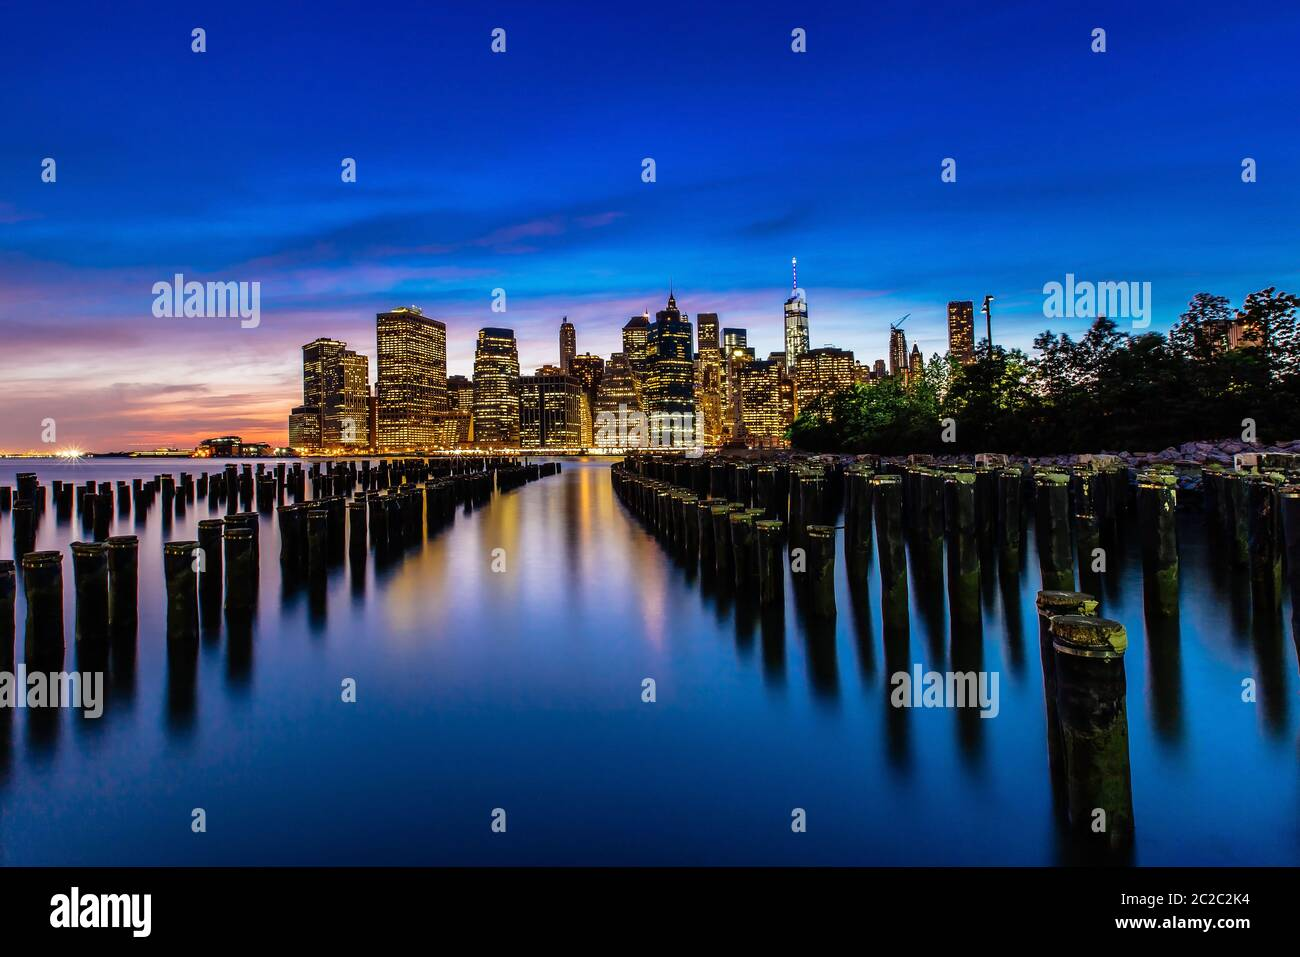 Sonnenuntergang auf Lower Manhattan Skyline, New York, United States Stockfoto